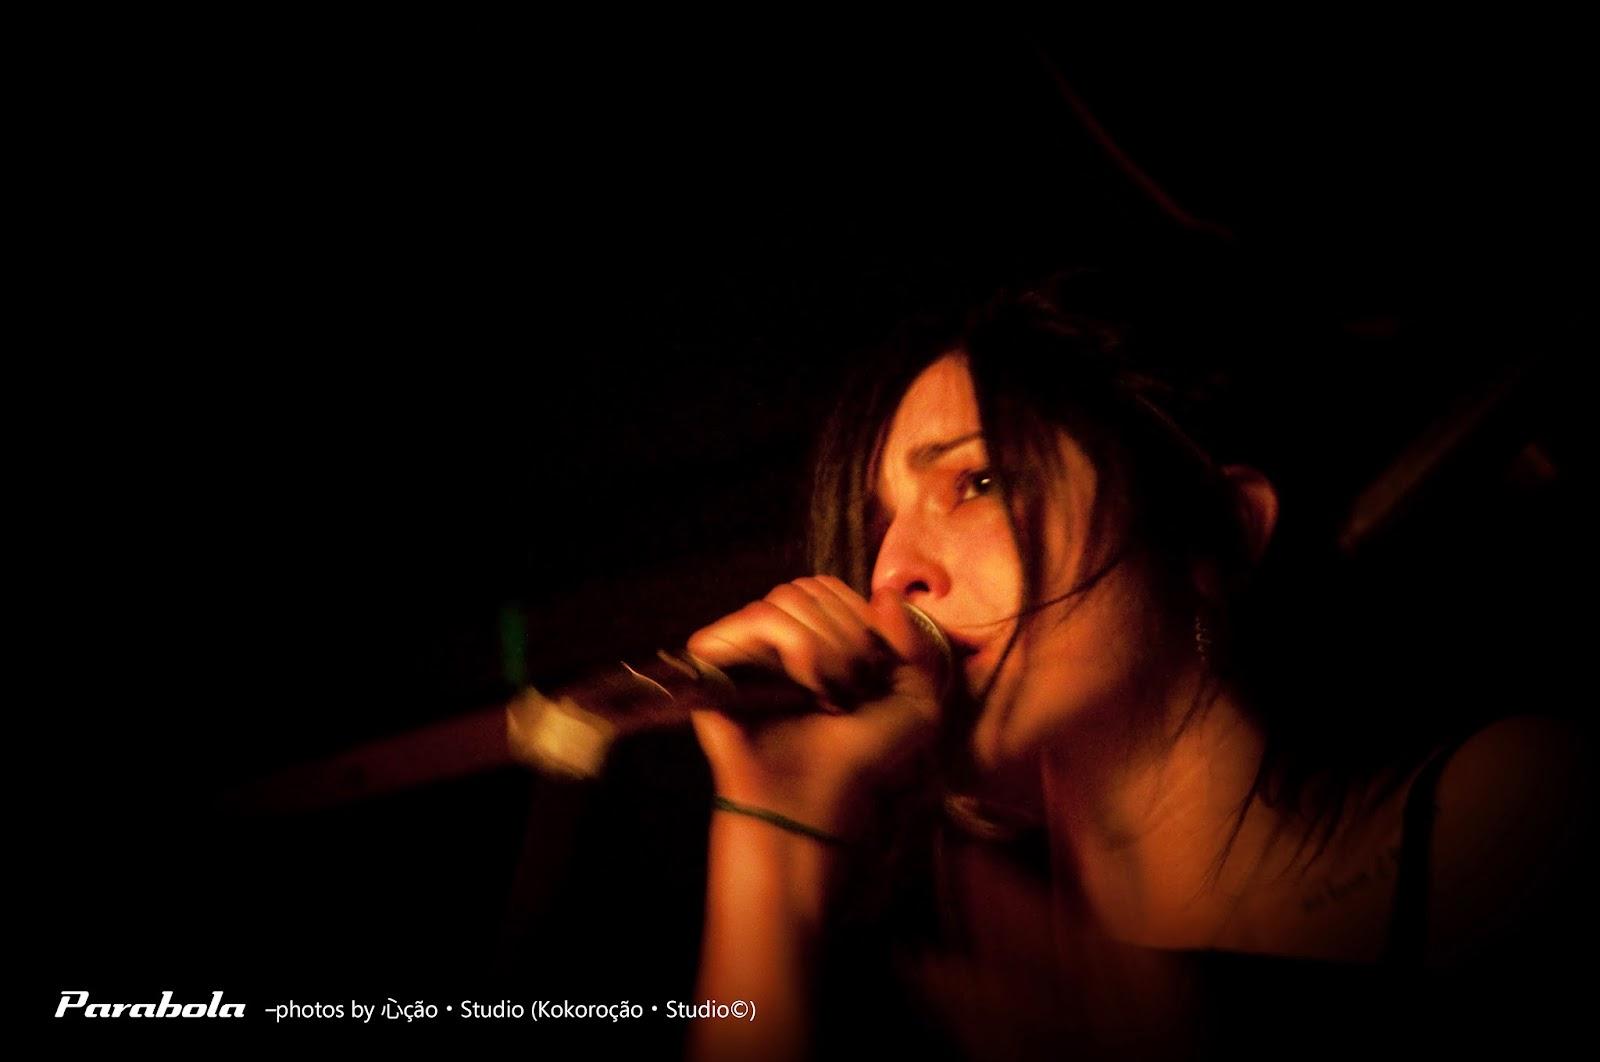 PHOTO SESSION - PARABOLA (TOOL TRIBUTE) LIVE AT GRUTA 77 - PART. 4